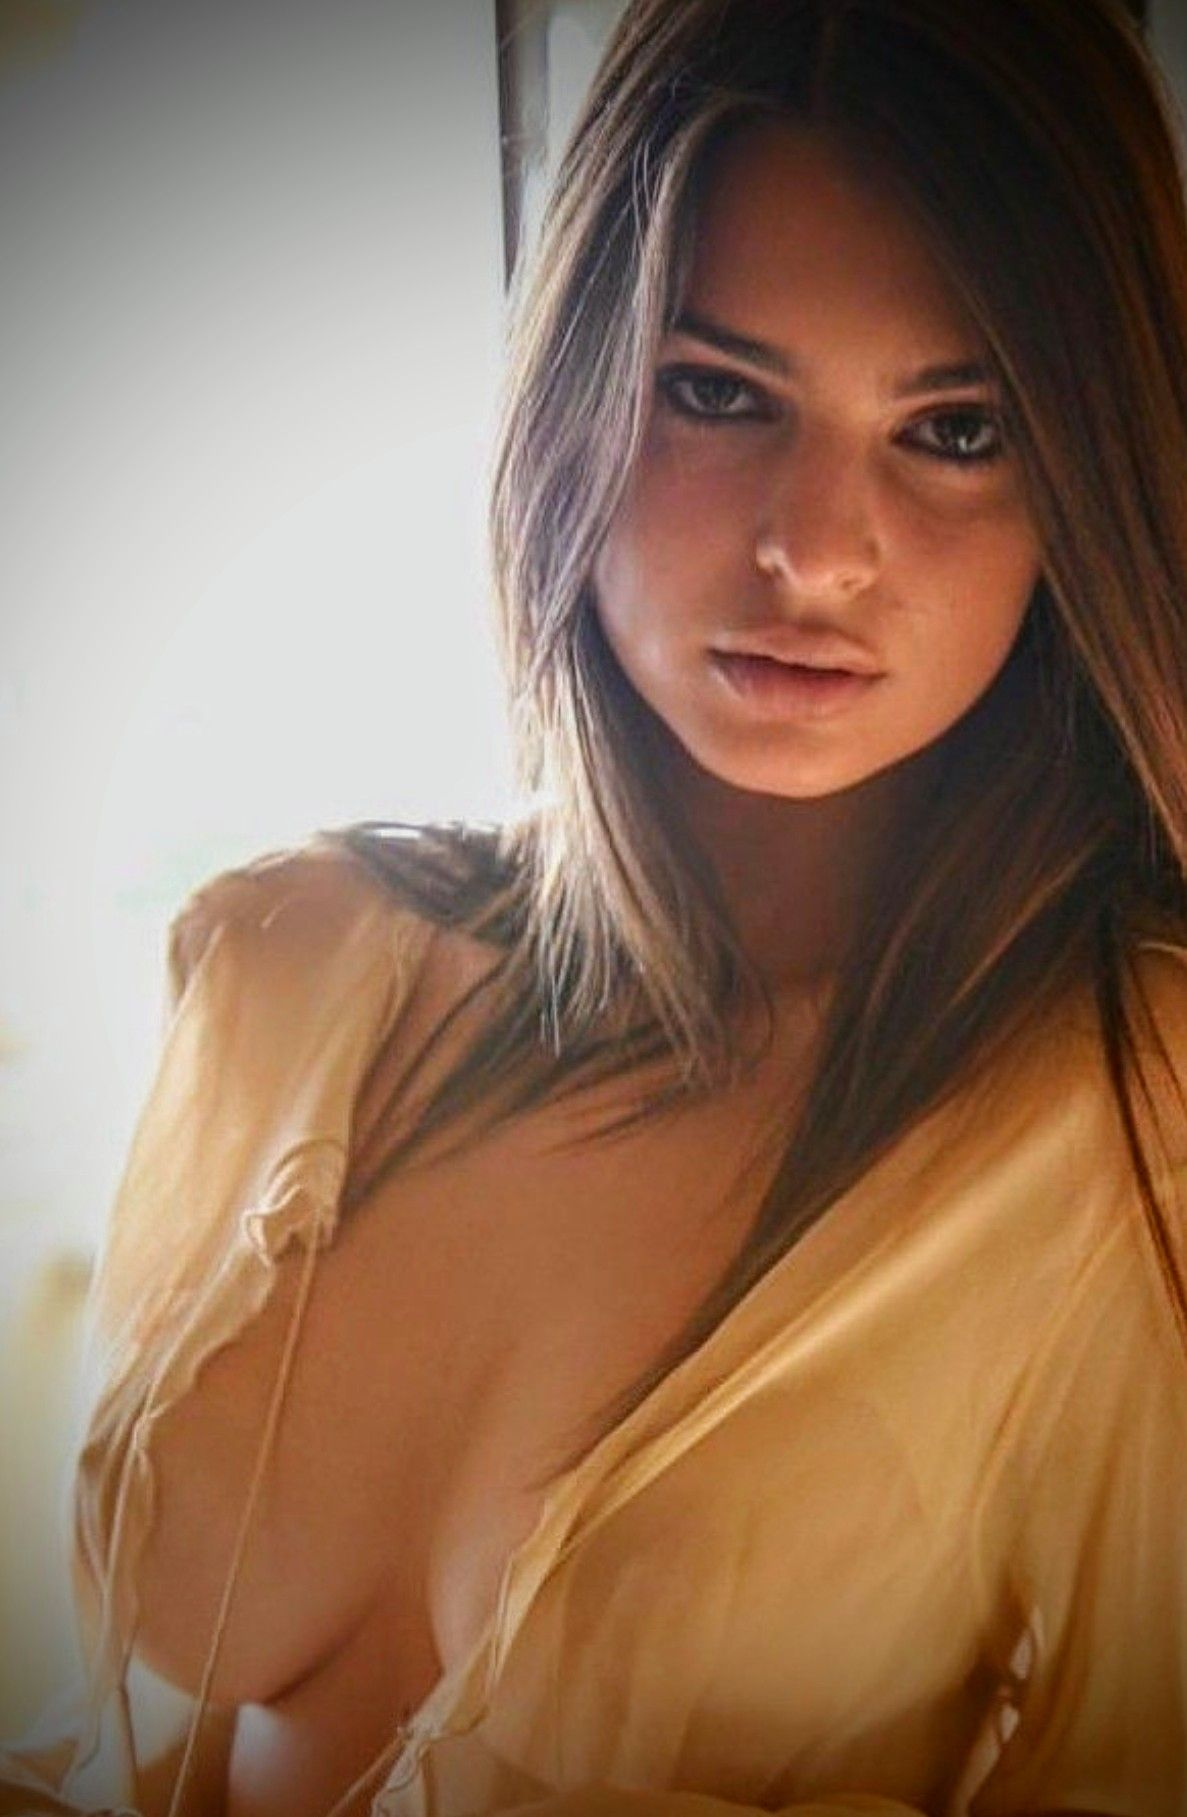 Emily ratajkowski beautiful eyes and big tits new picture